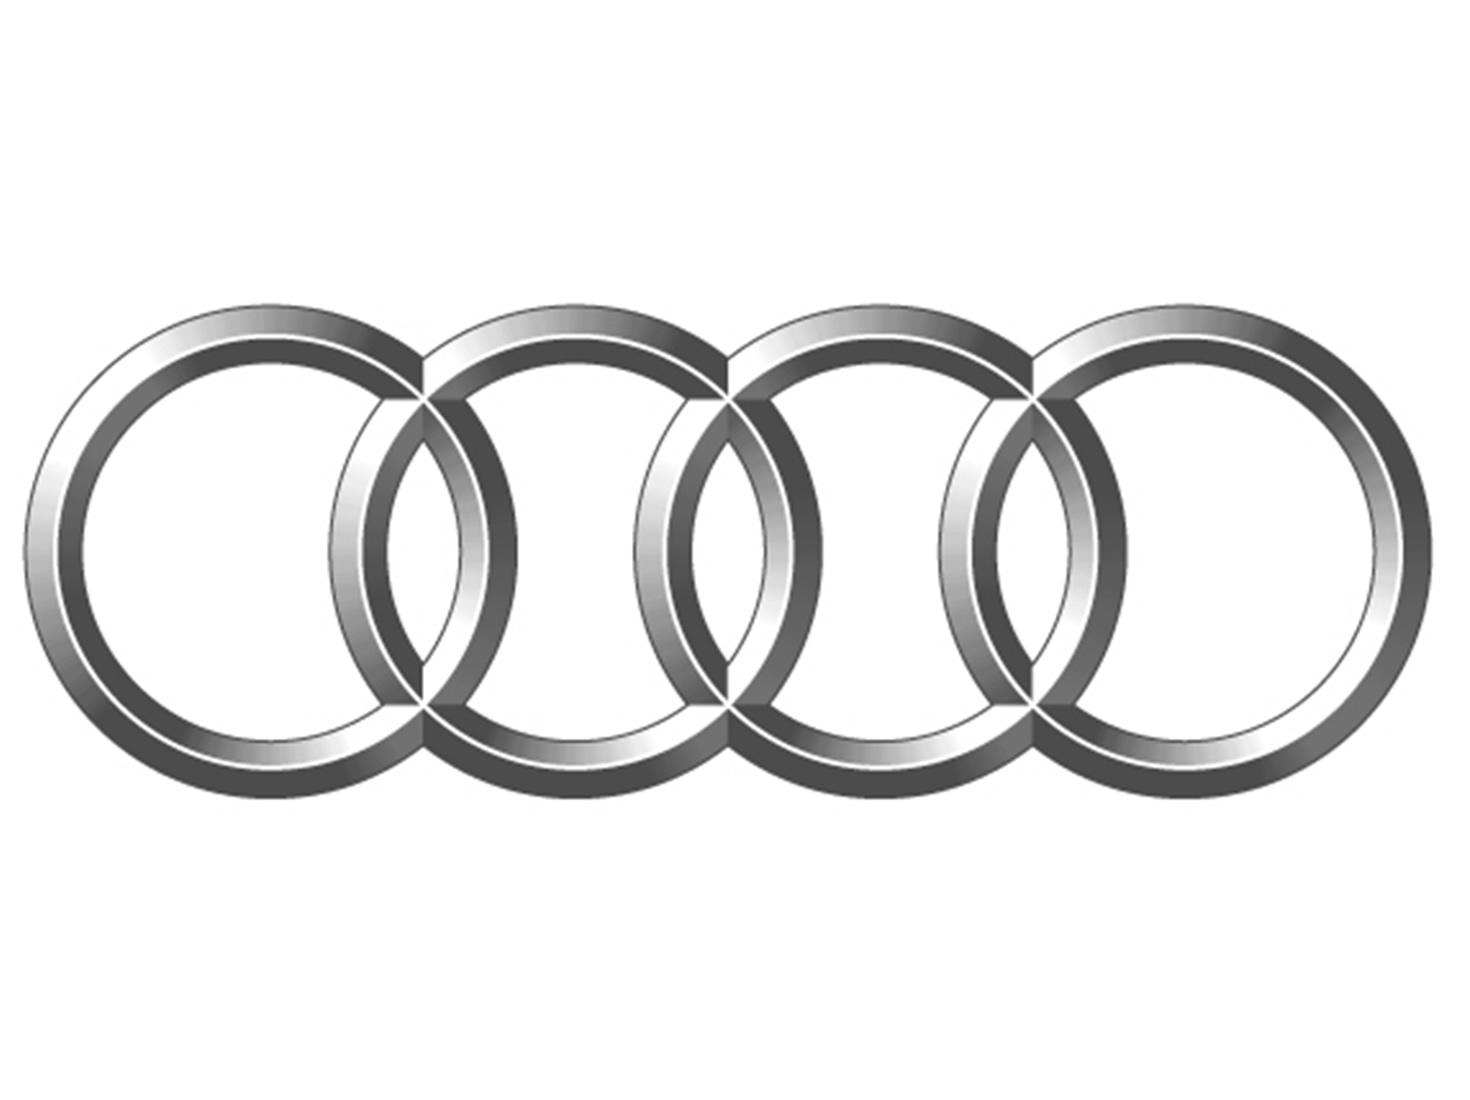 Audi Rings Logos